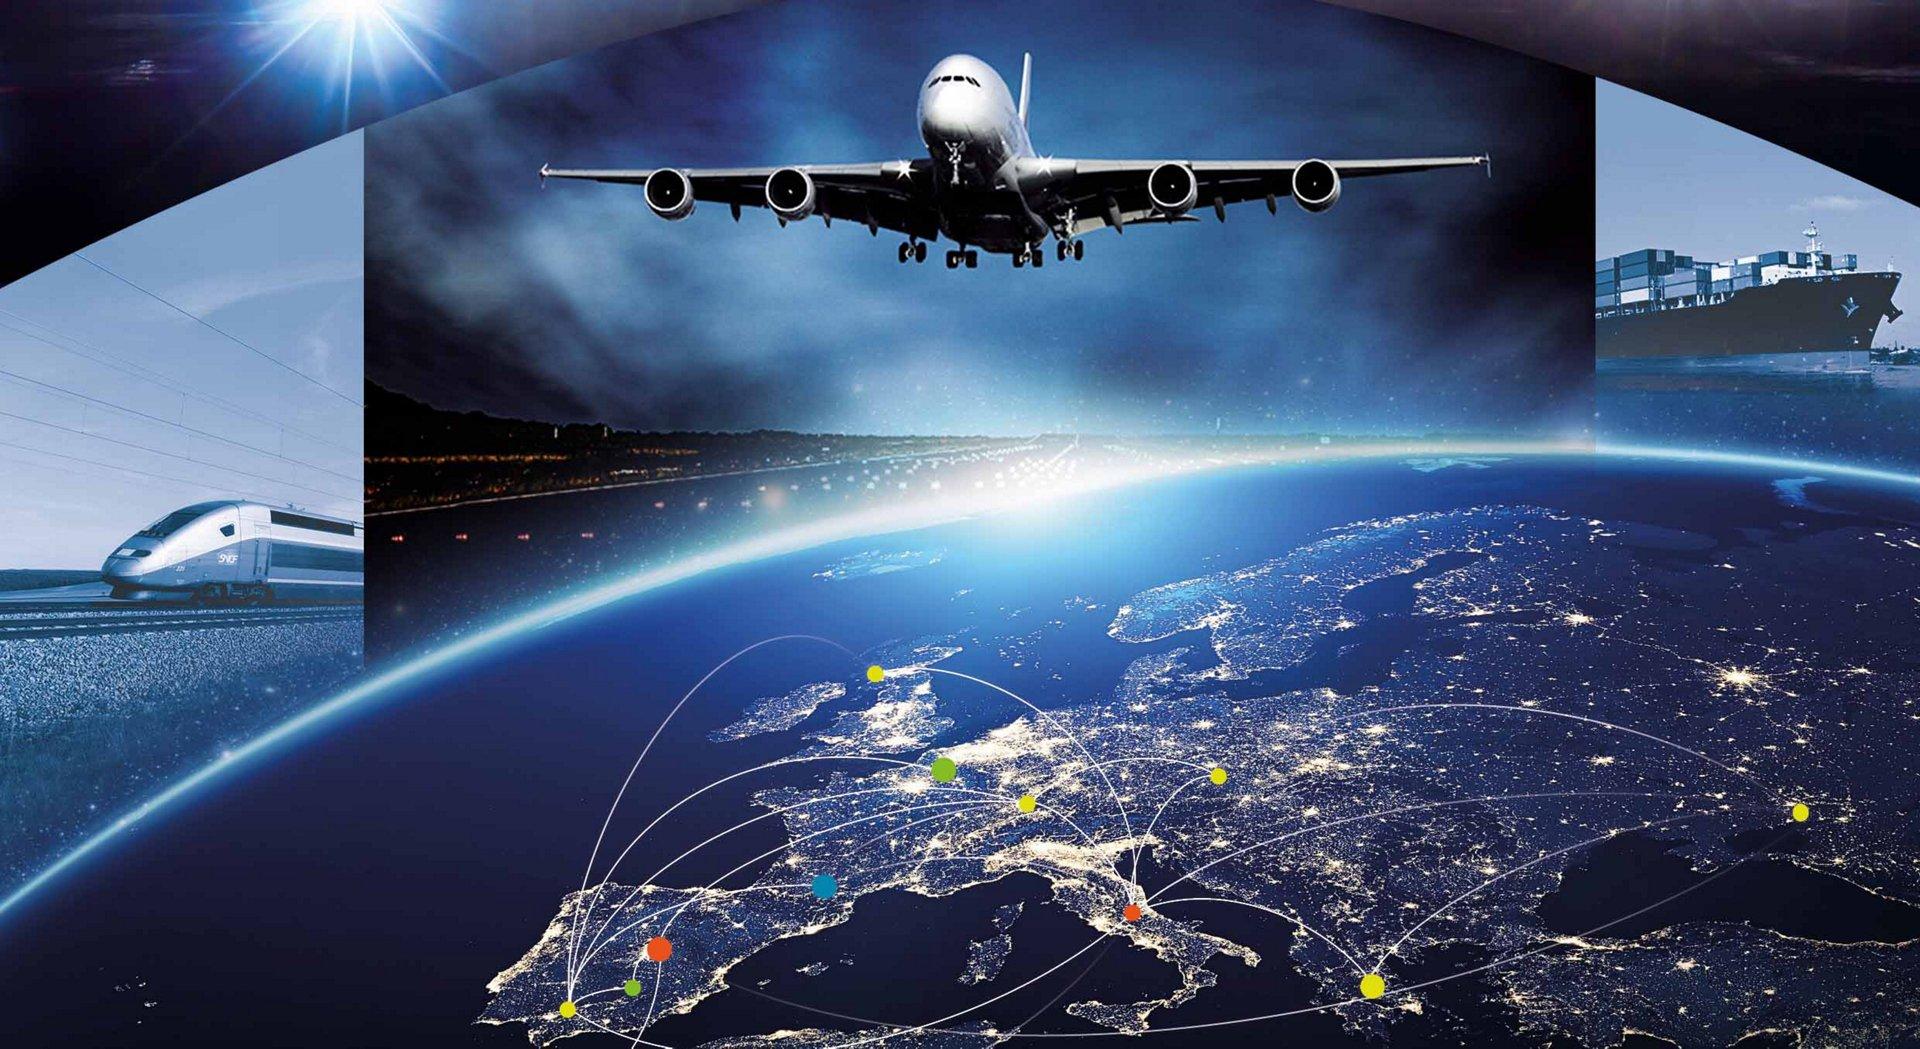 EGNOS the European Geostationary Navigation Overlay Service